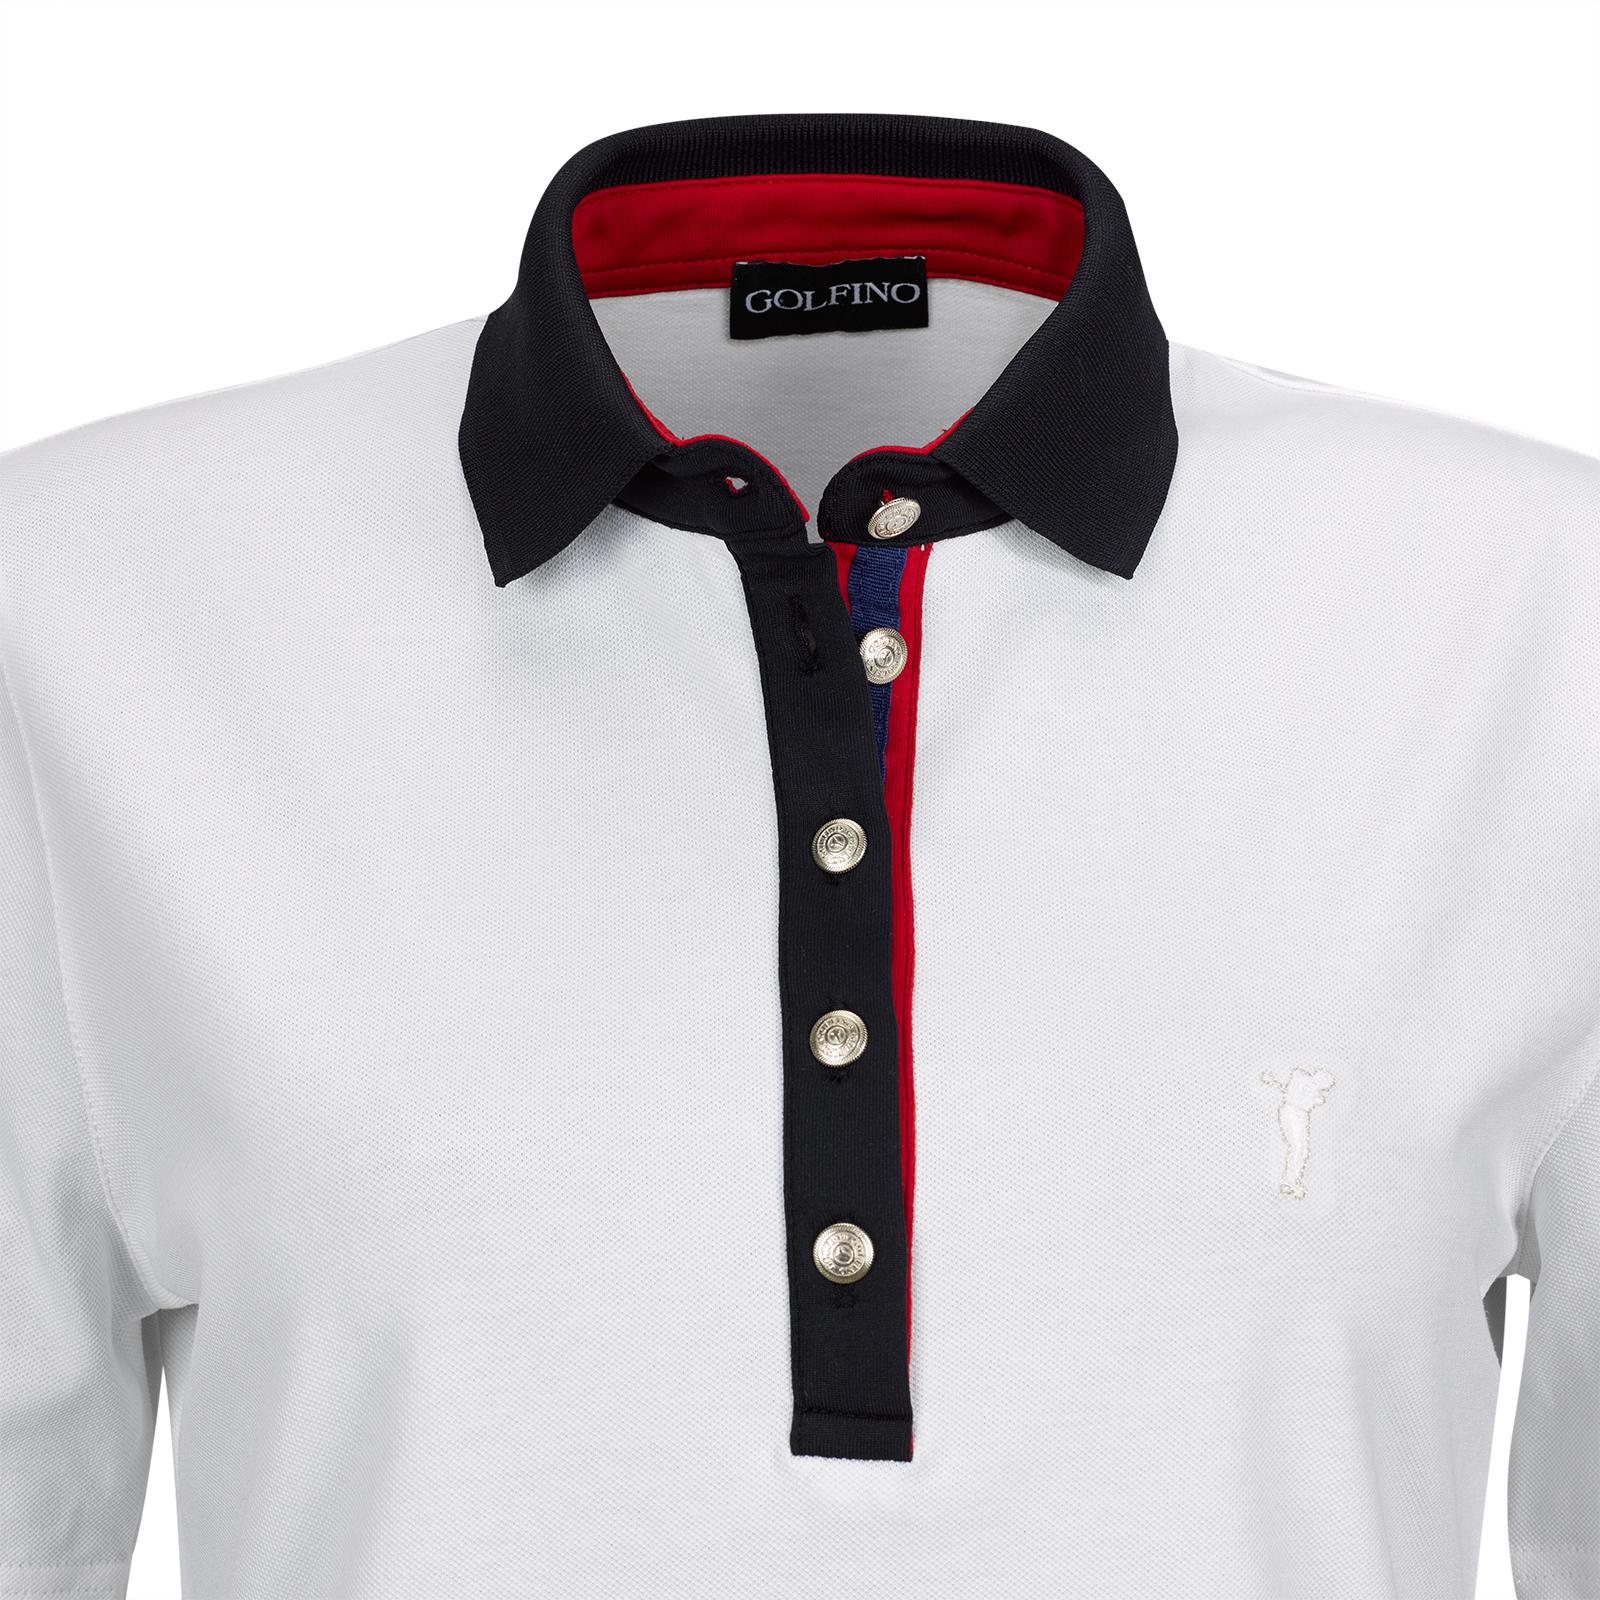 Kurzarm Damen Baumwoll-Golfpolo aus exklusivem Stretchmaterial in Slim Fit